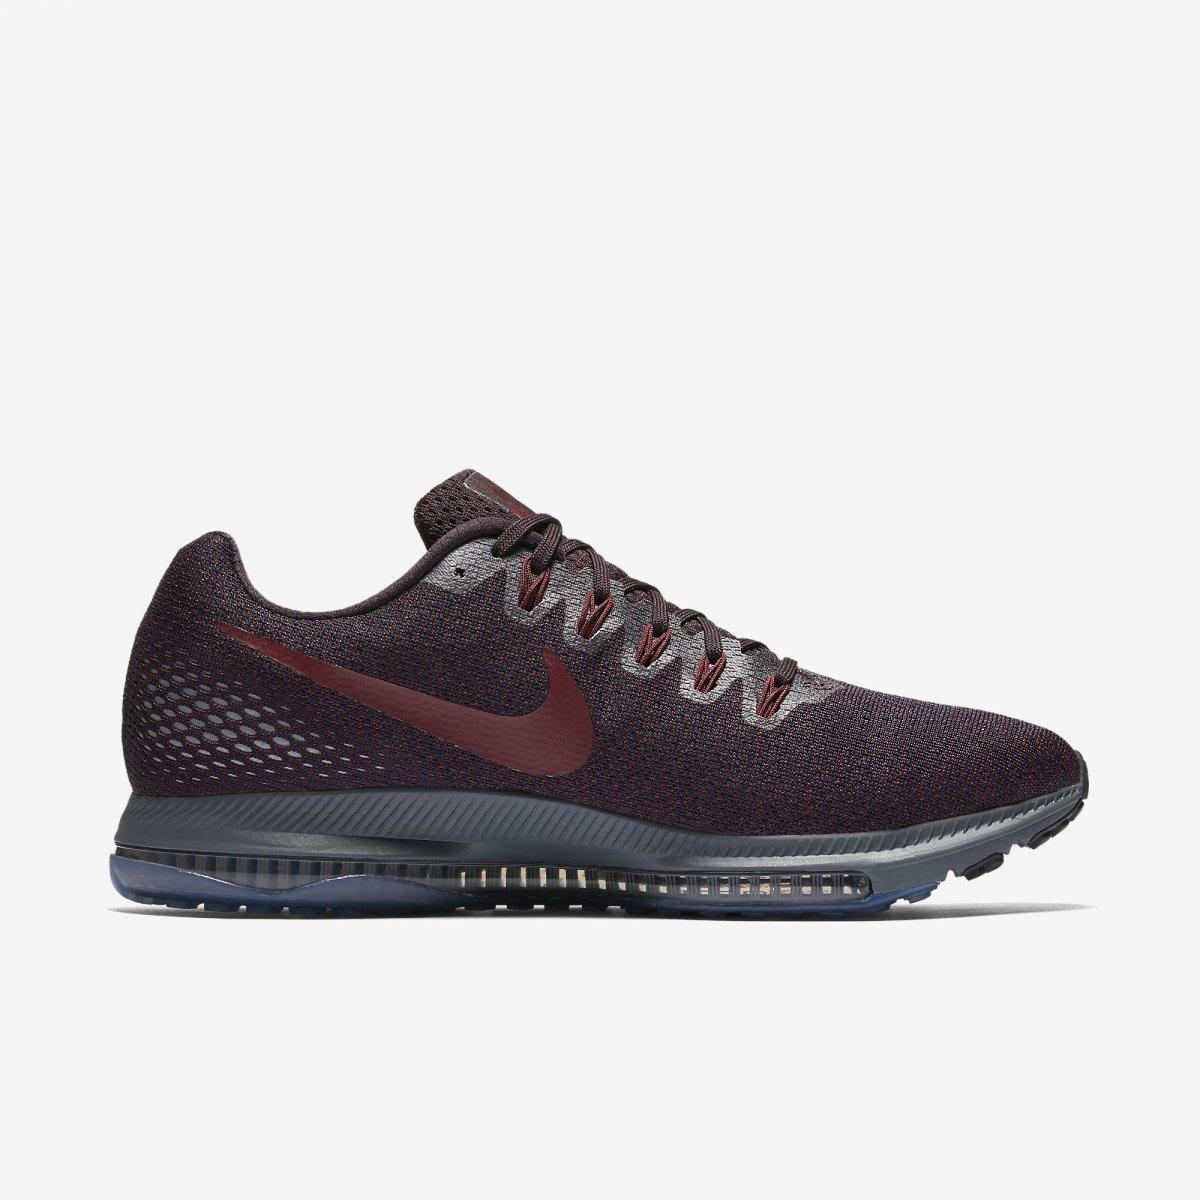 df2177e3a4 Tênis Masculino Nike Zoom All Out Low 878670-602 Vermelho